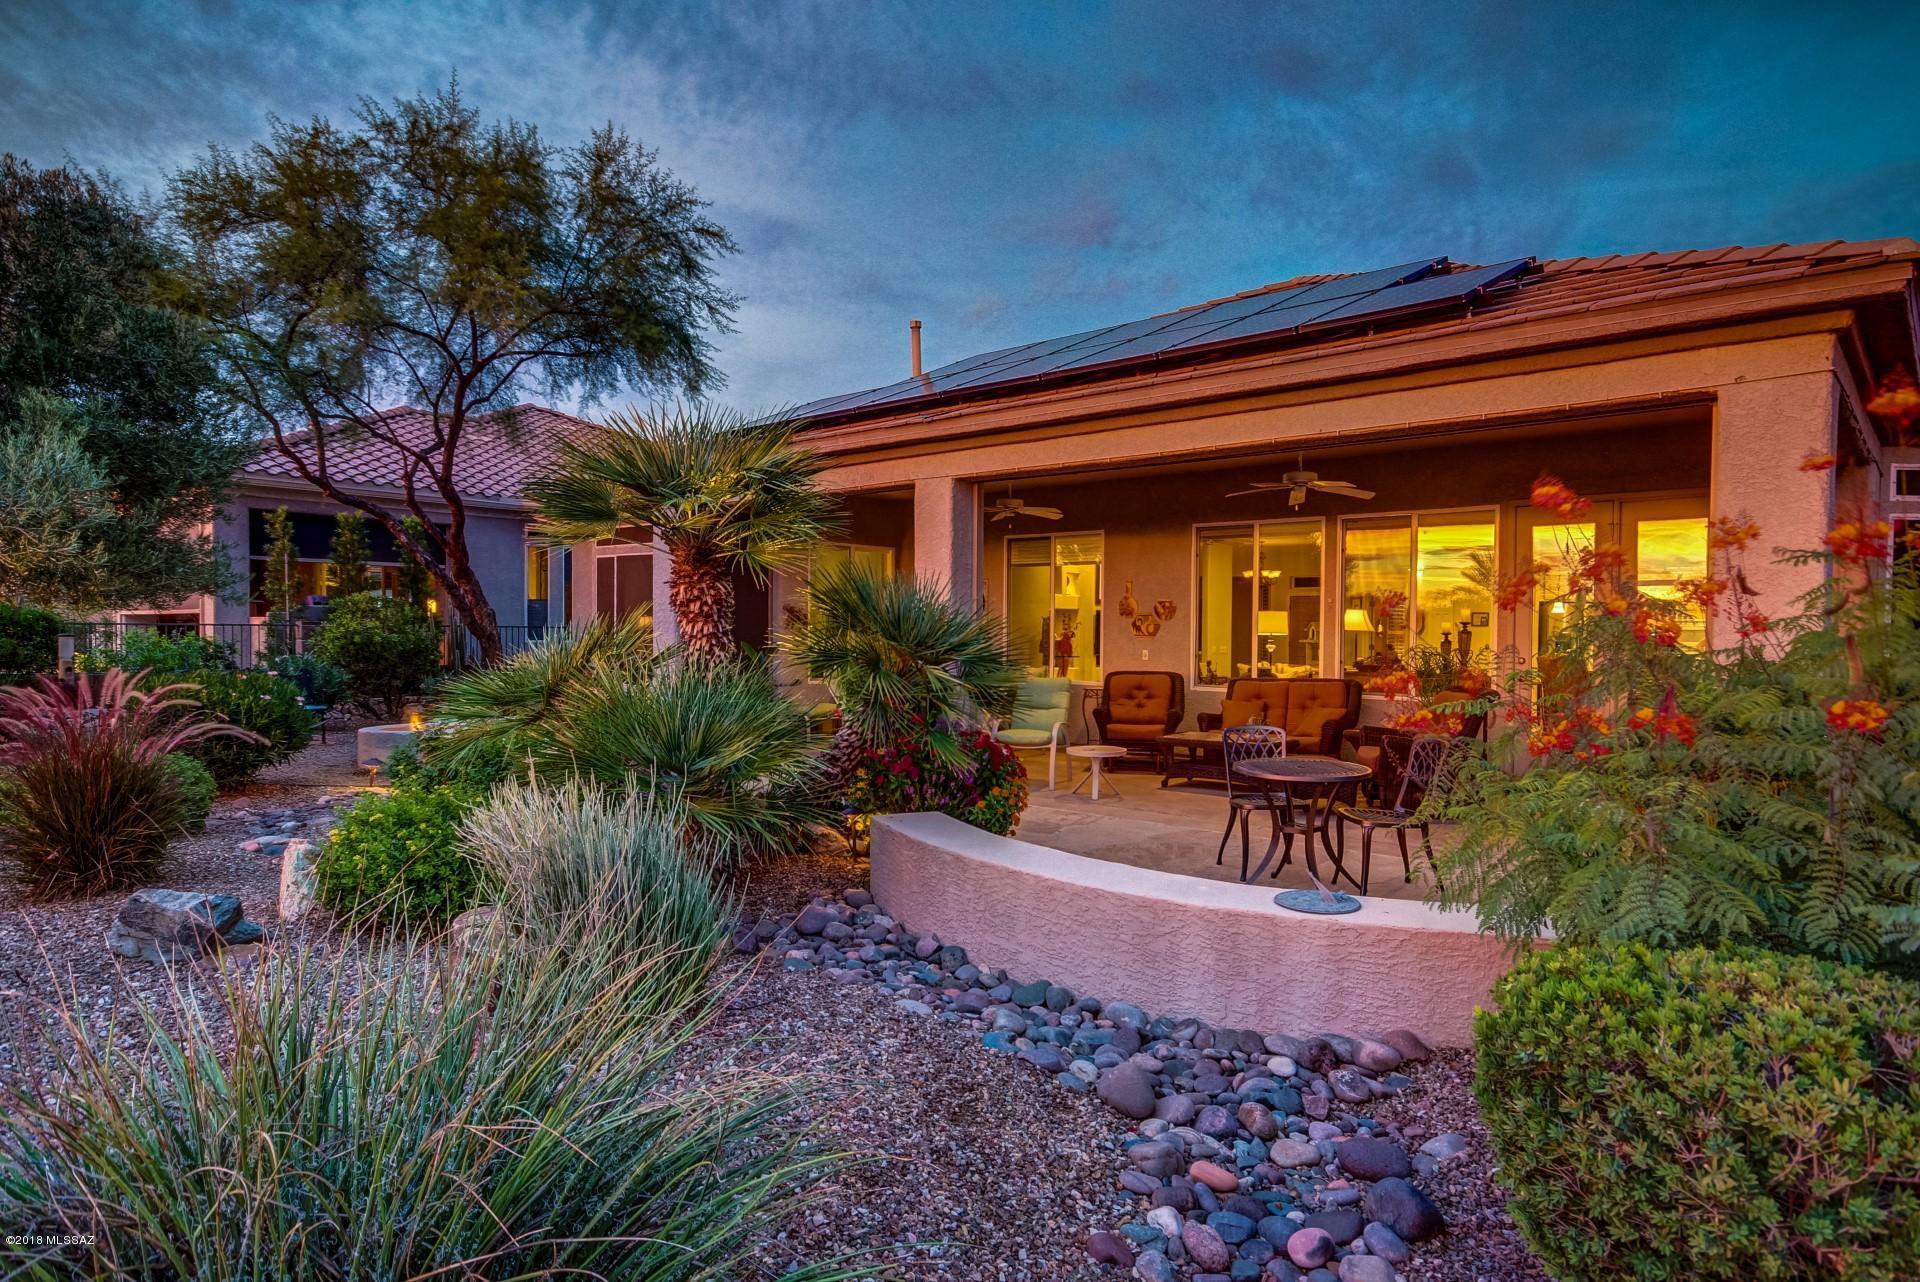 13537 N Heritage Gateway Avenue, Marana, AZ 85658 - Tucson MLS ...